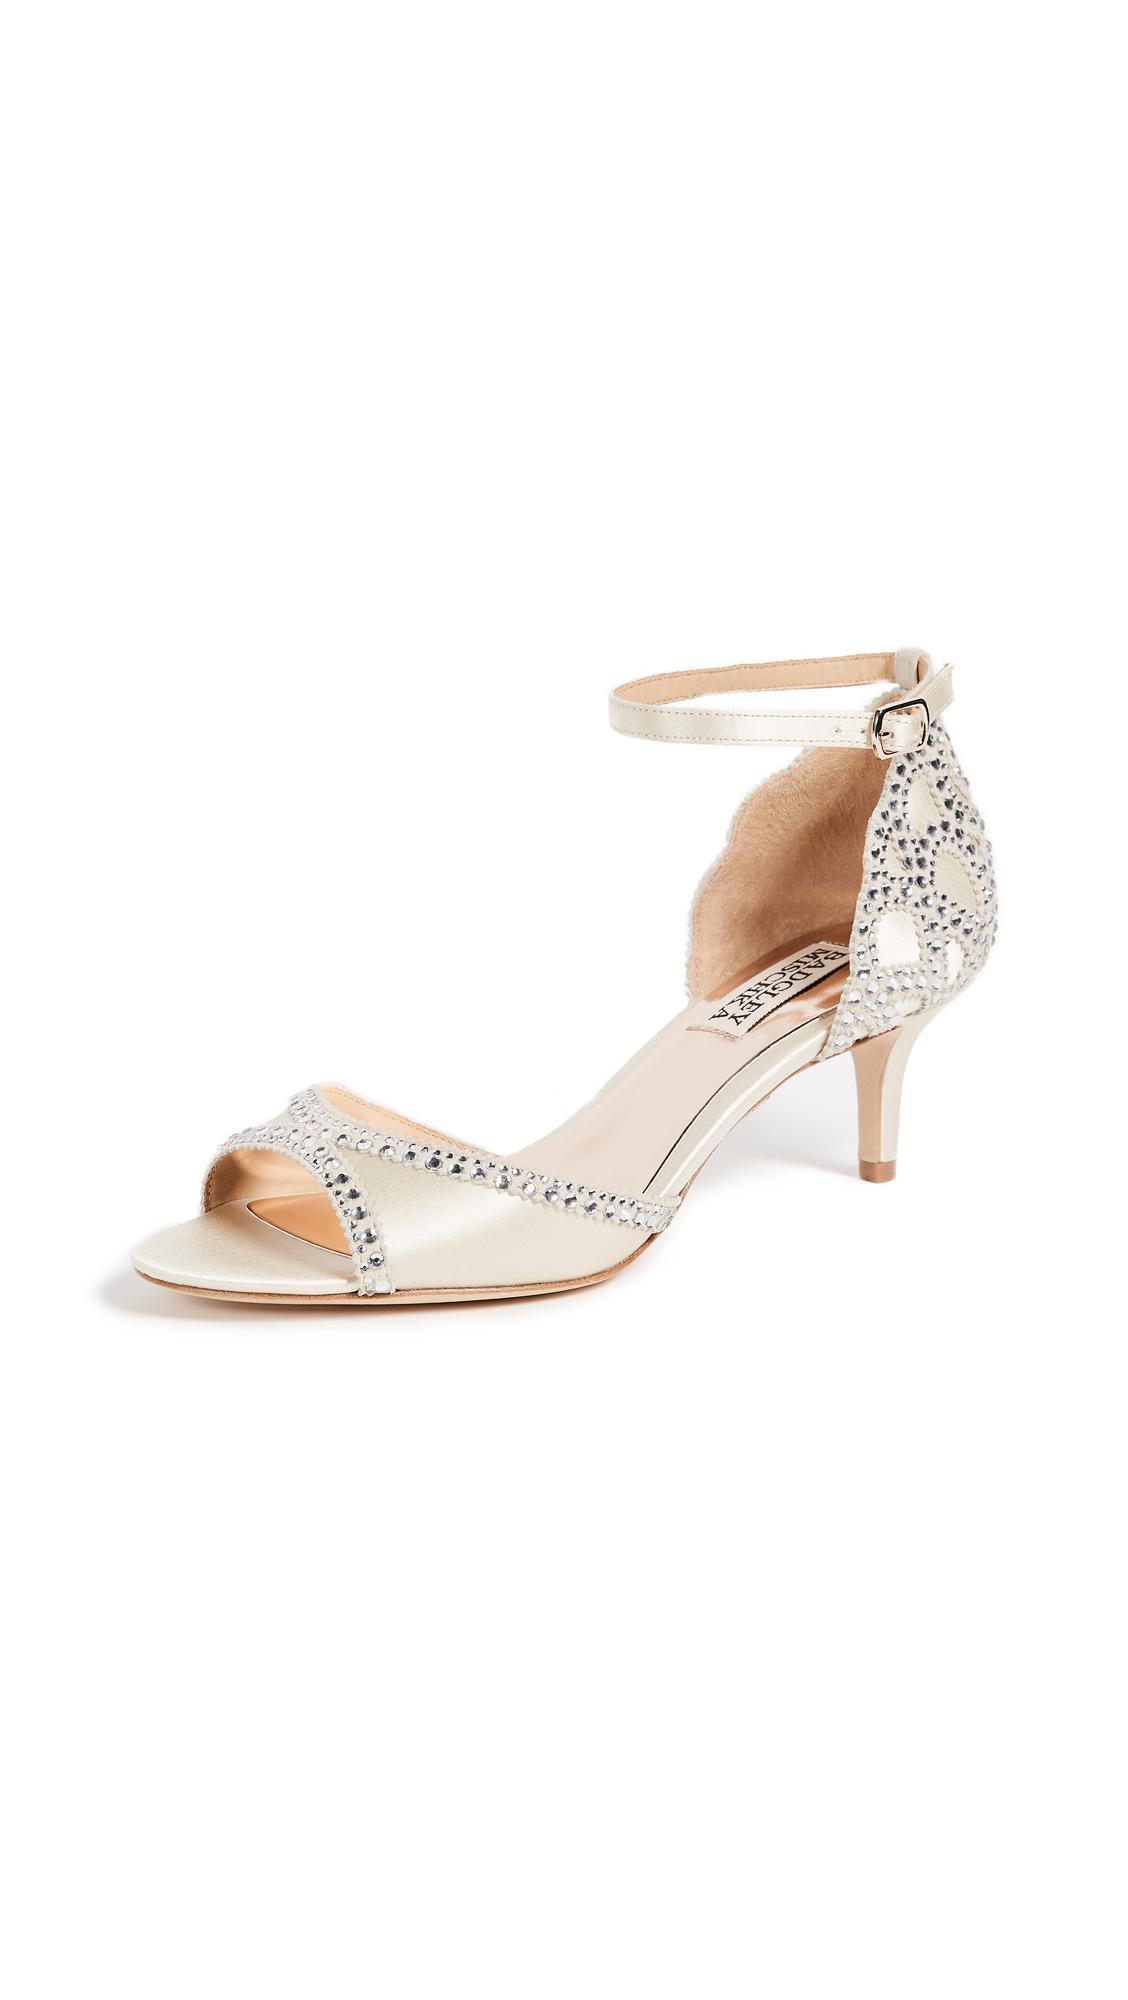 Badgley Mischka Gillian Open Toe Sandals - Ivory